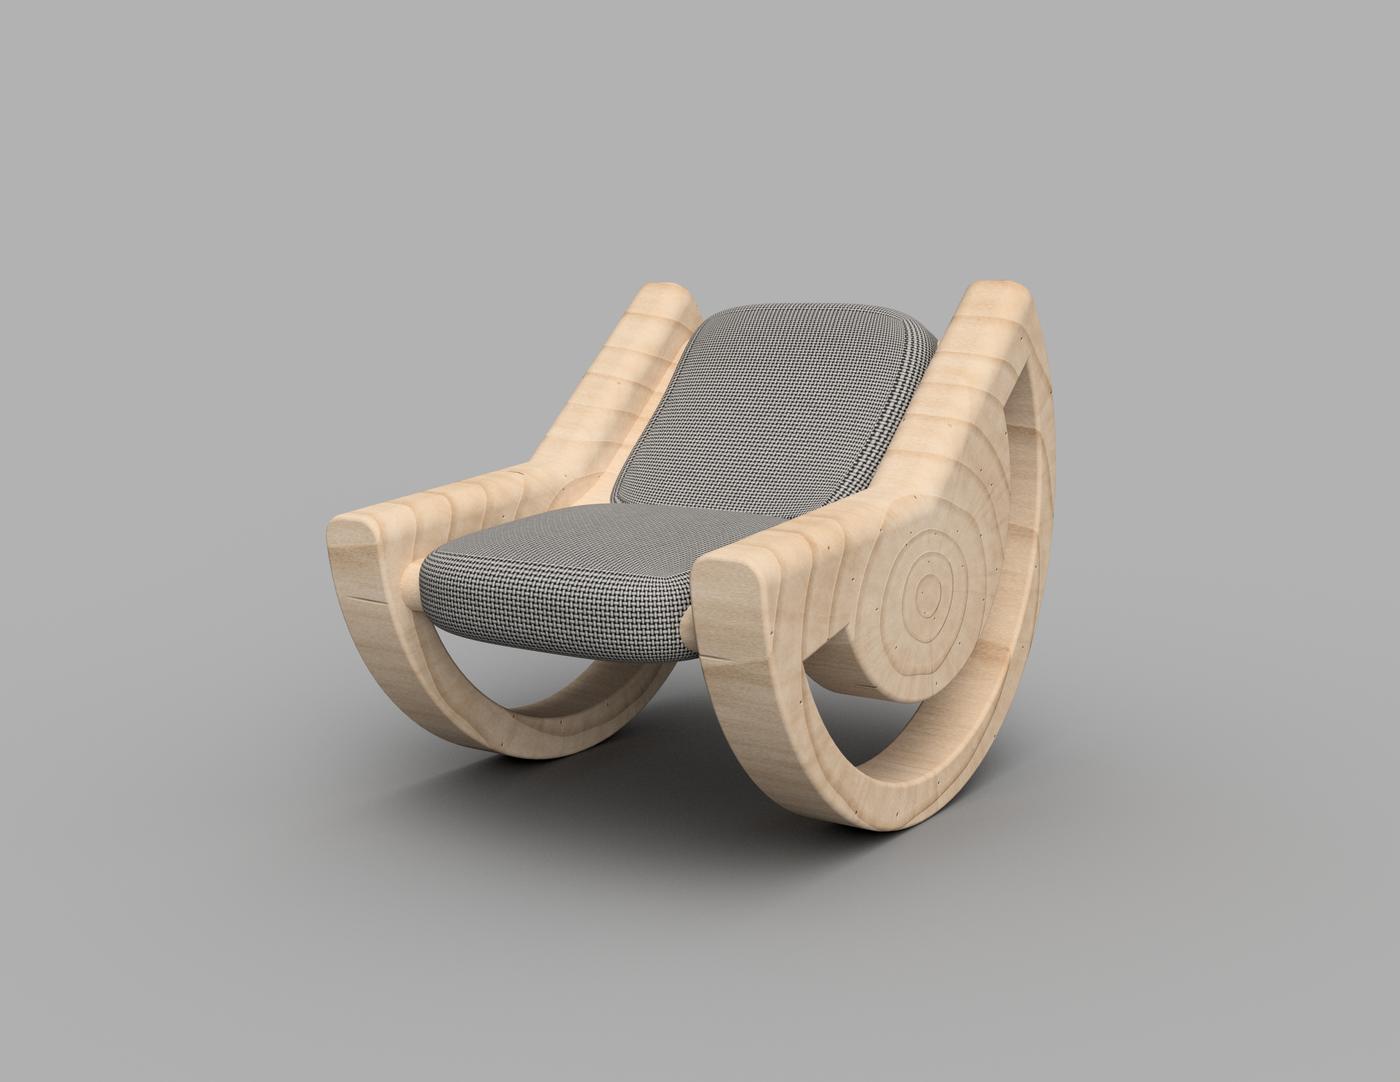 Peachy Circular Wedge Rocker Chair By Jordan Linton At Coroflot Com Customarchery Wood Chair Design Ideas Customarcherynet